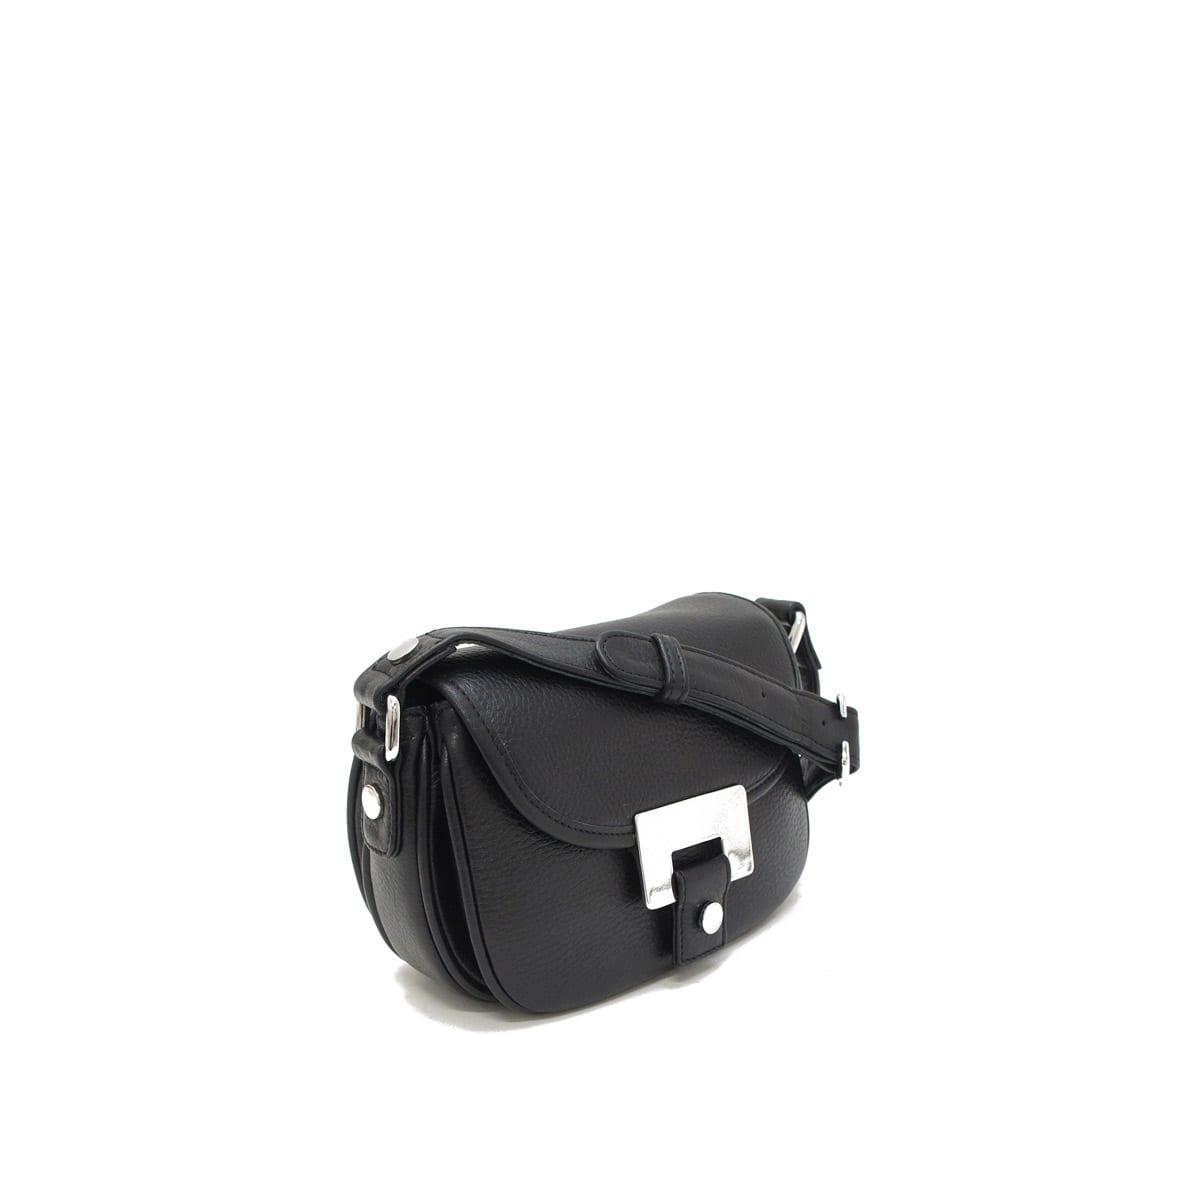 Lumi Laukku Olivia : Olivia mini saddler black lumi accessories